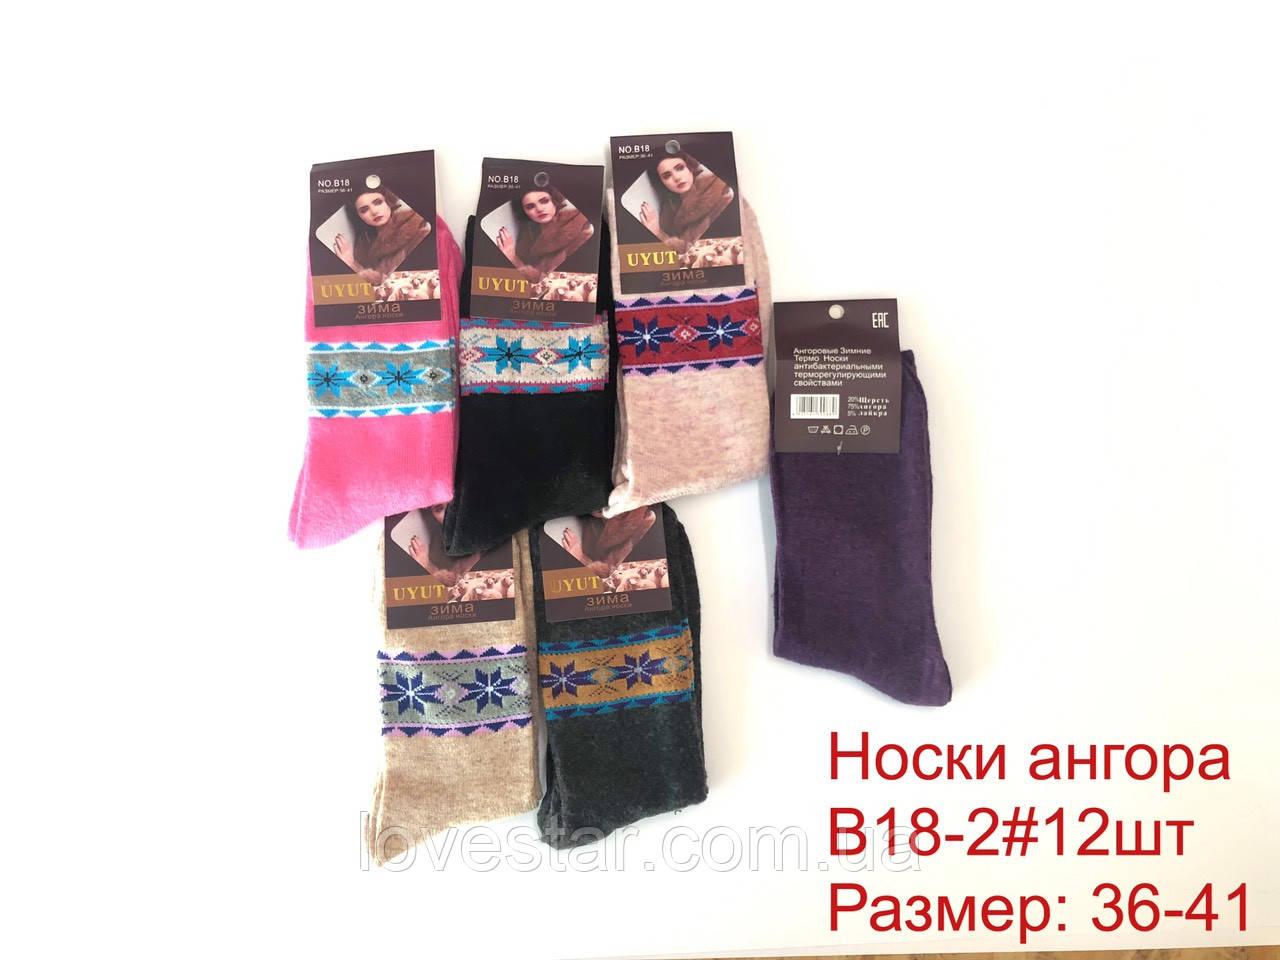 Женские Зимние Носки Ангора